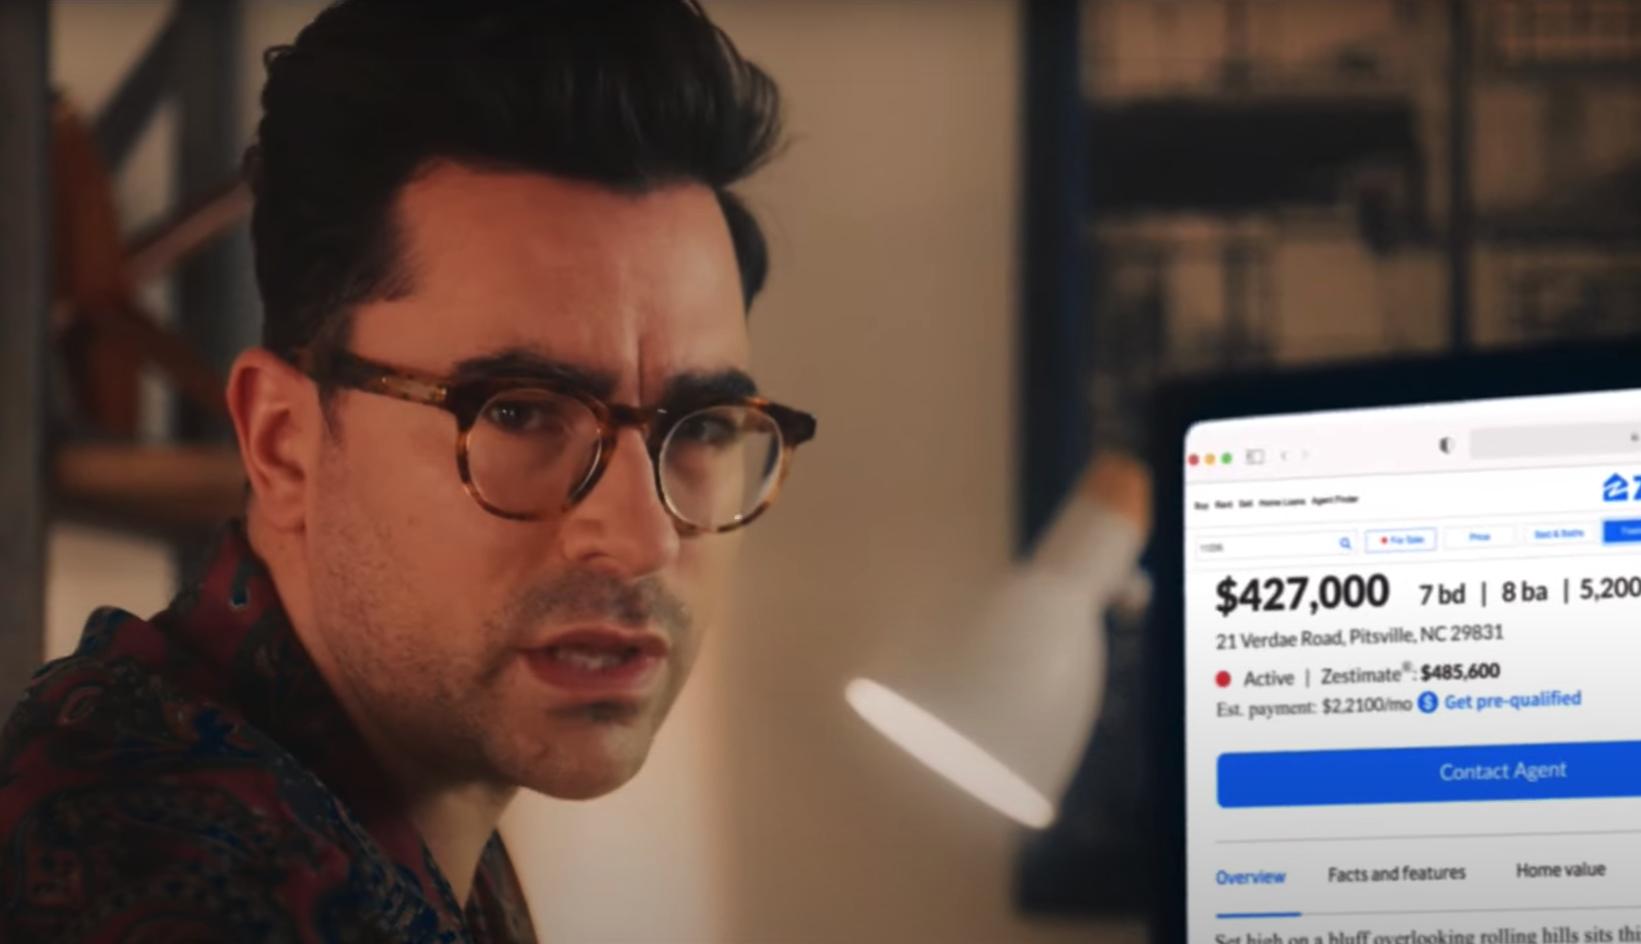 SNL's Zillow skit captured America's real estate obsession - Quartz